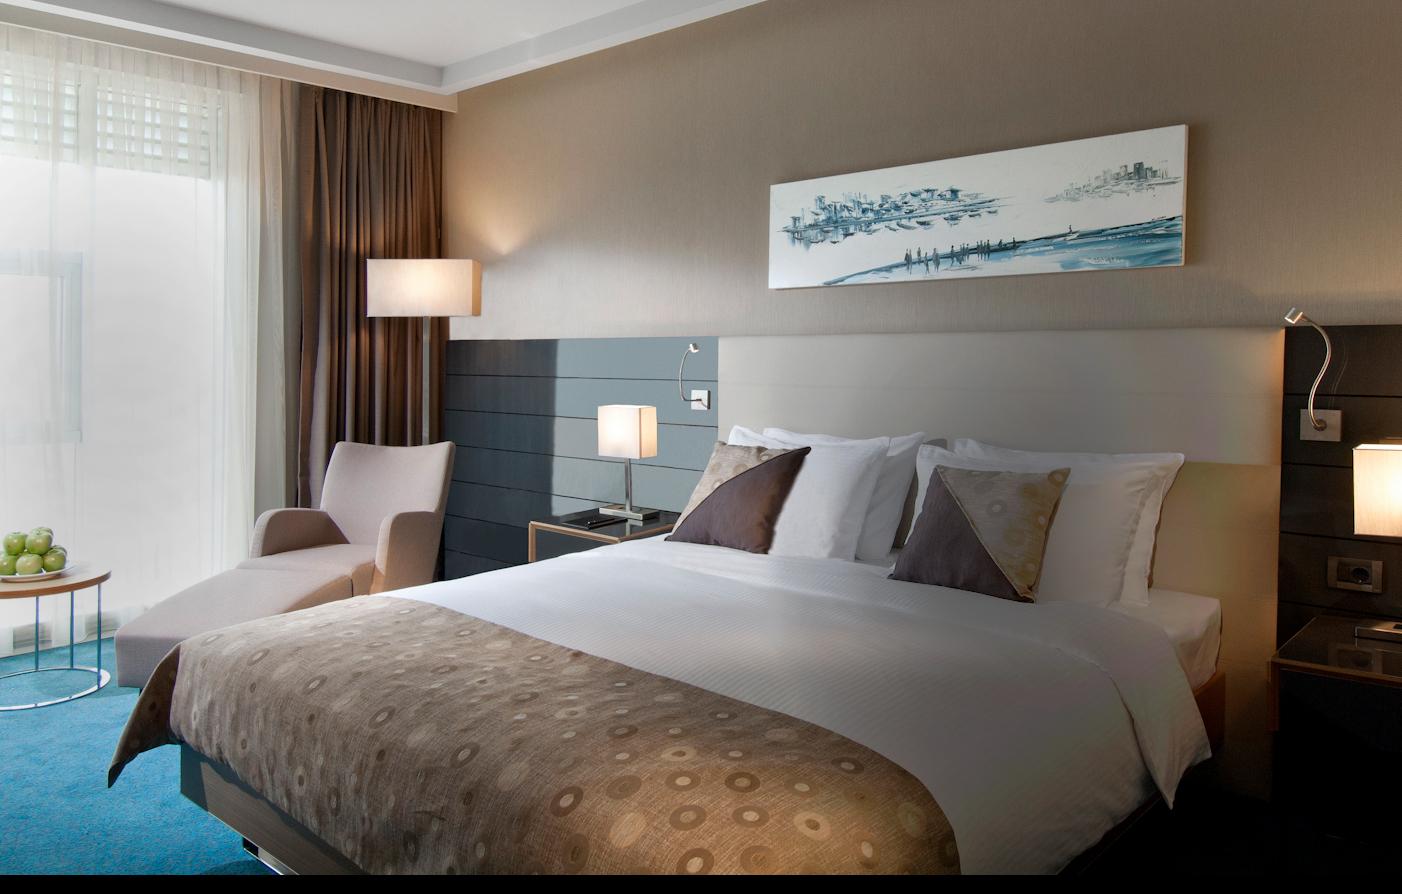 Corlu Hotel Divan Accommodations Divan çorlu in